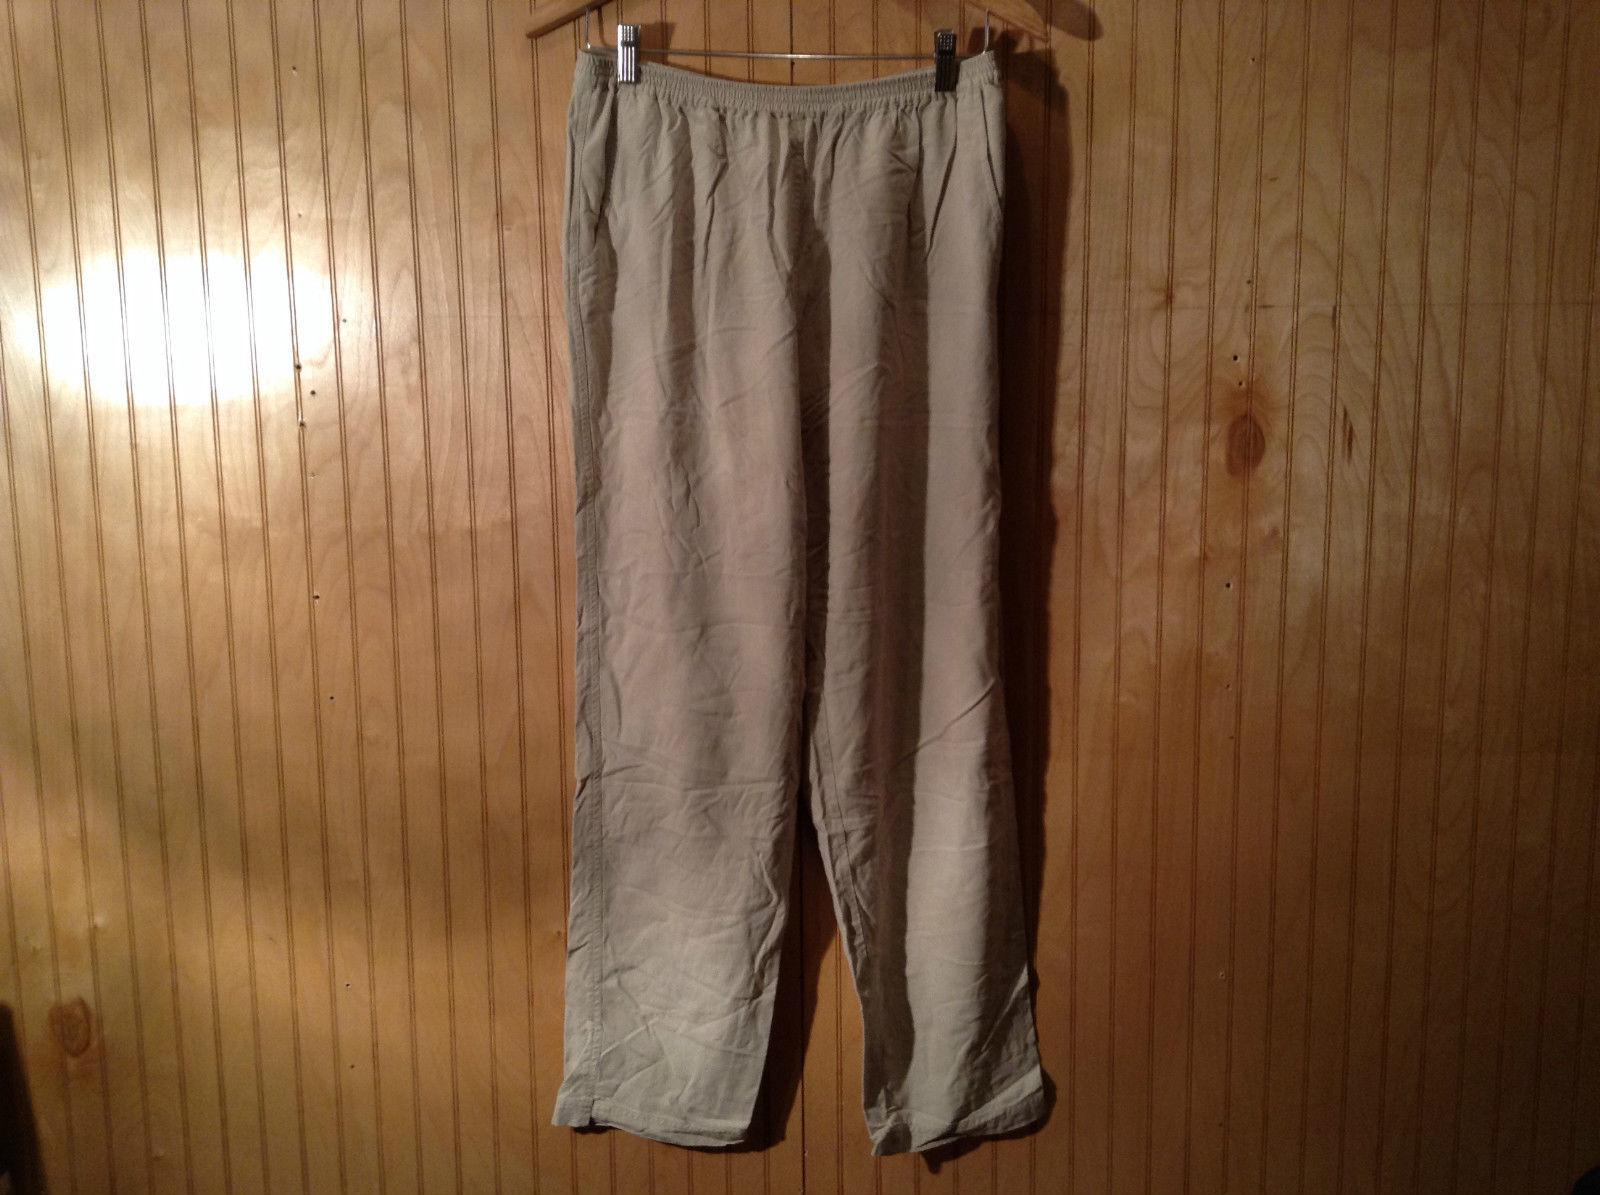 Unbranded 100 Percent Silk Tan Comfort Pants Size Large Elastic Waist